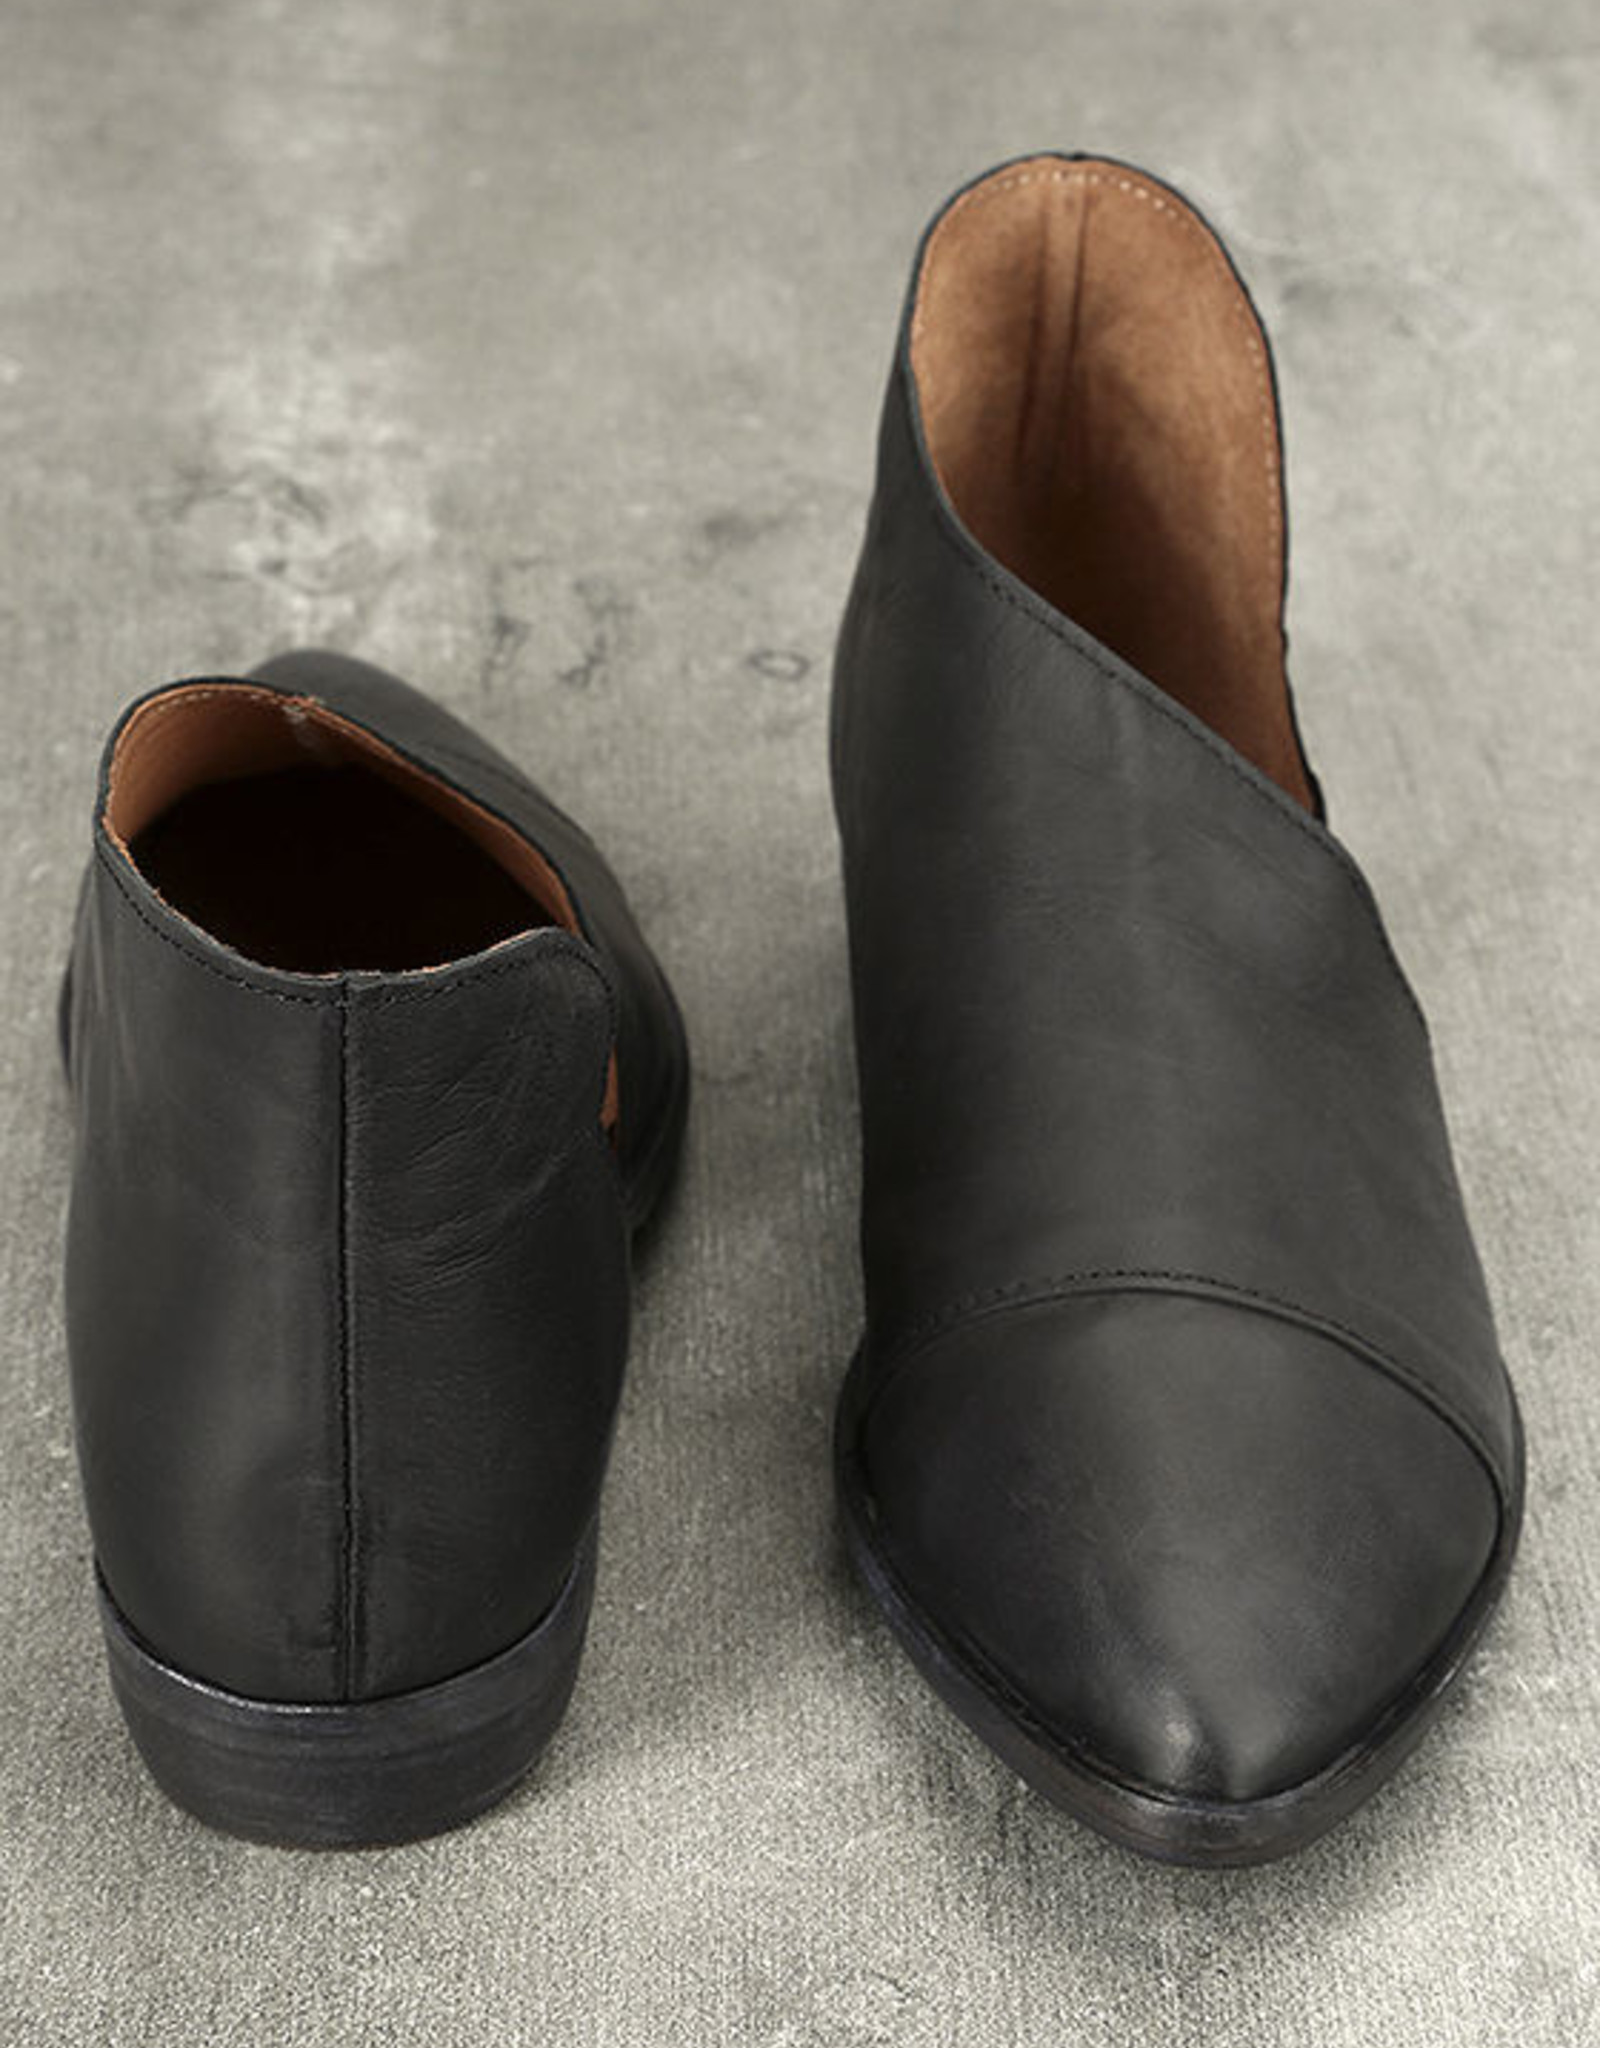 FREE PEOPLE Flat Royale Shoe, BLACK leather